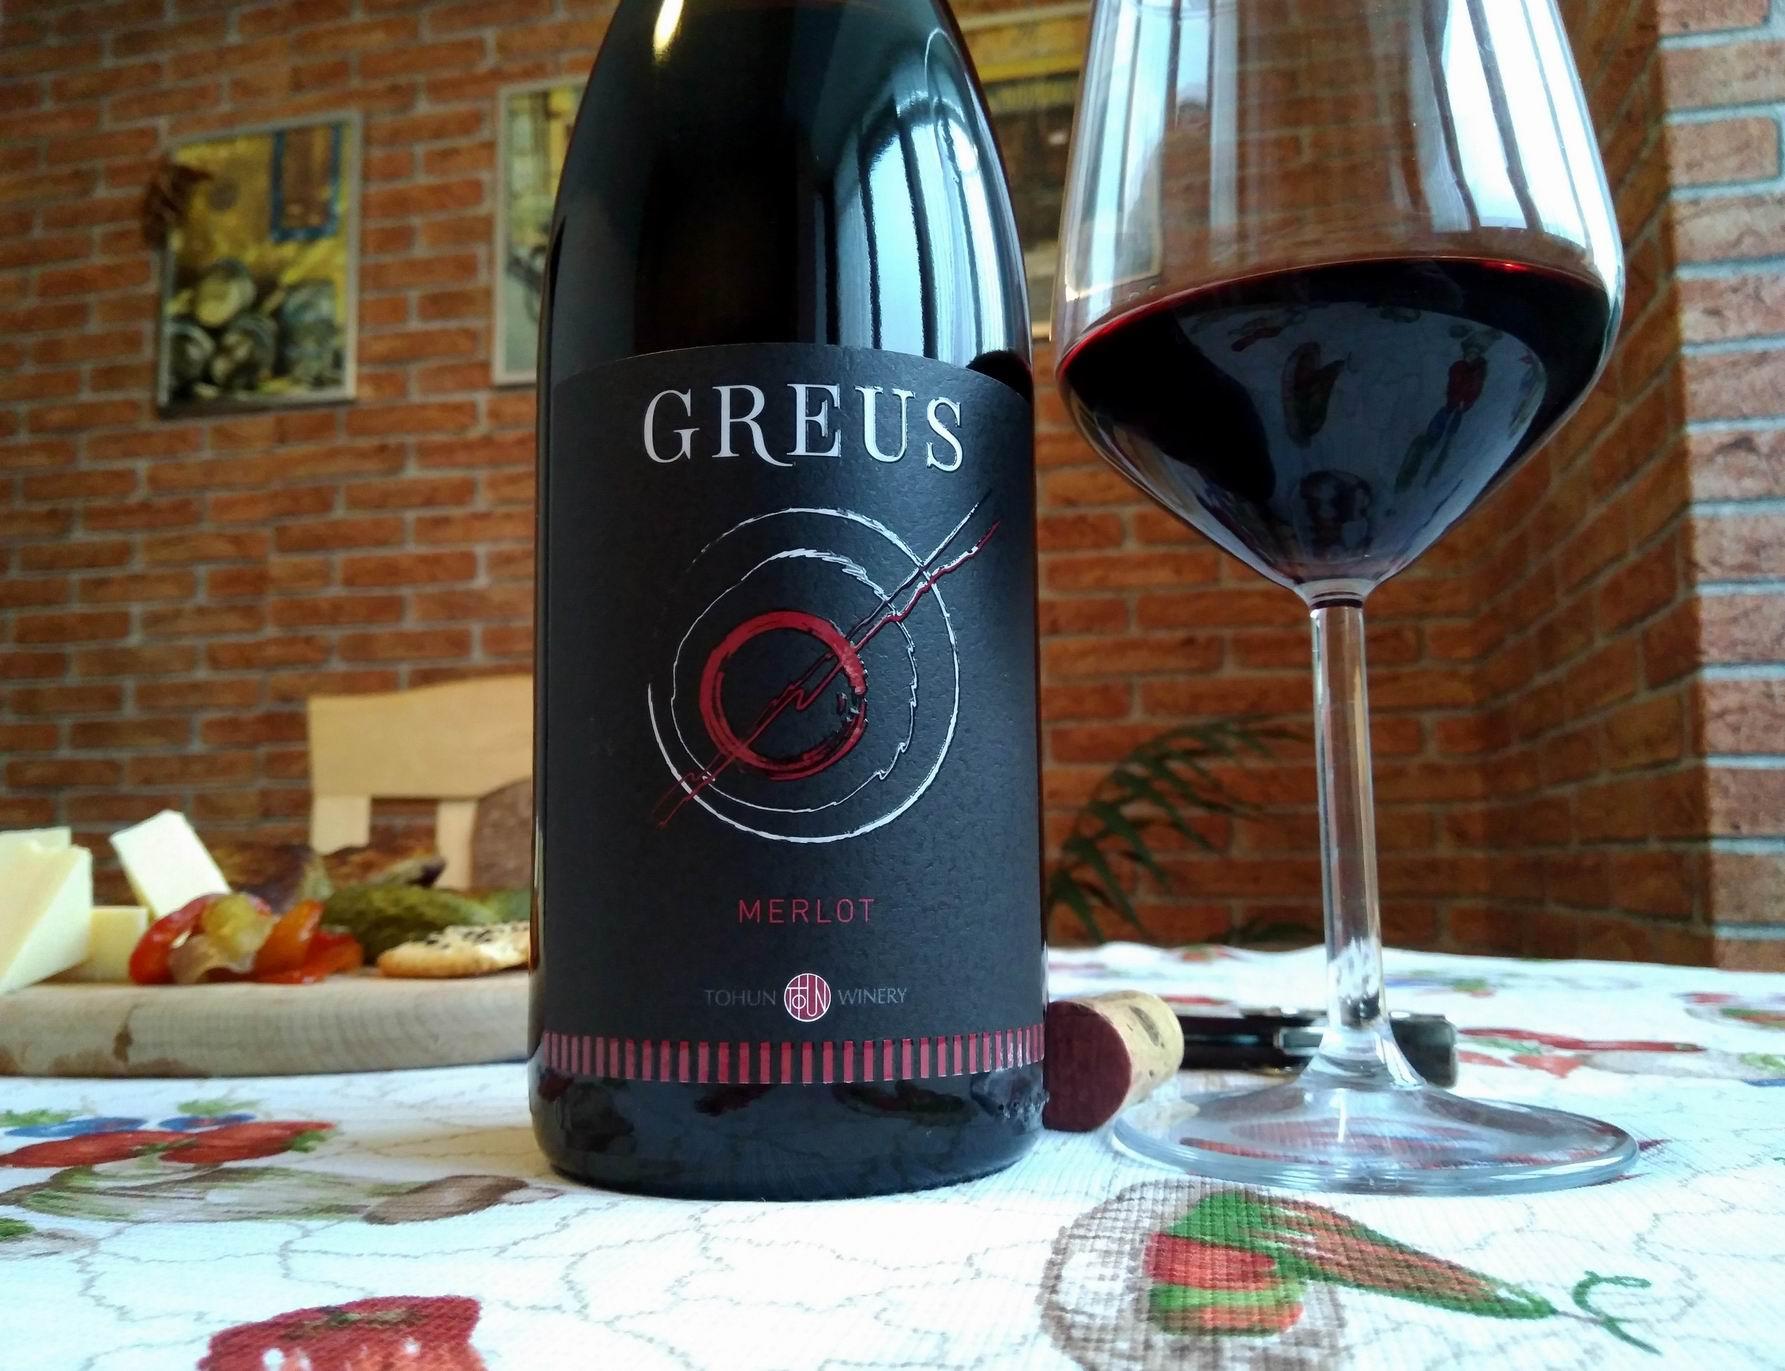 Greus Merlot 2013 – Tohun Winery